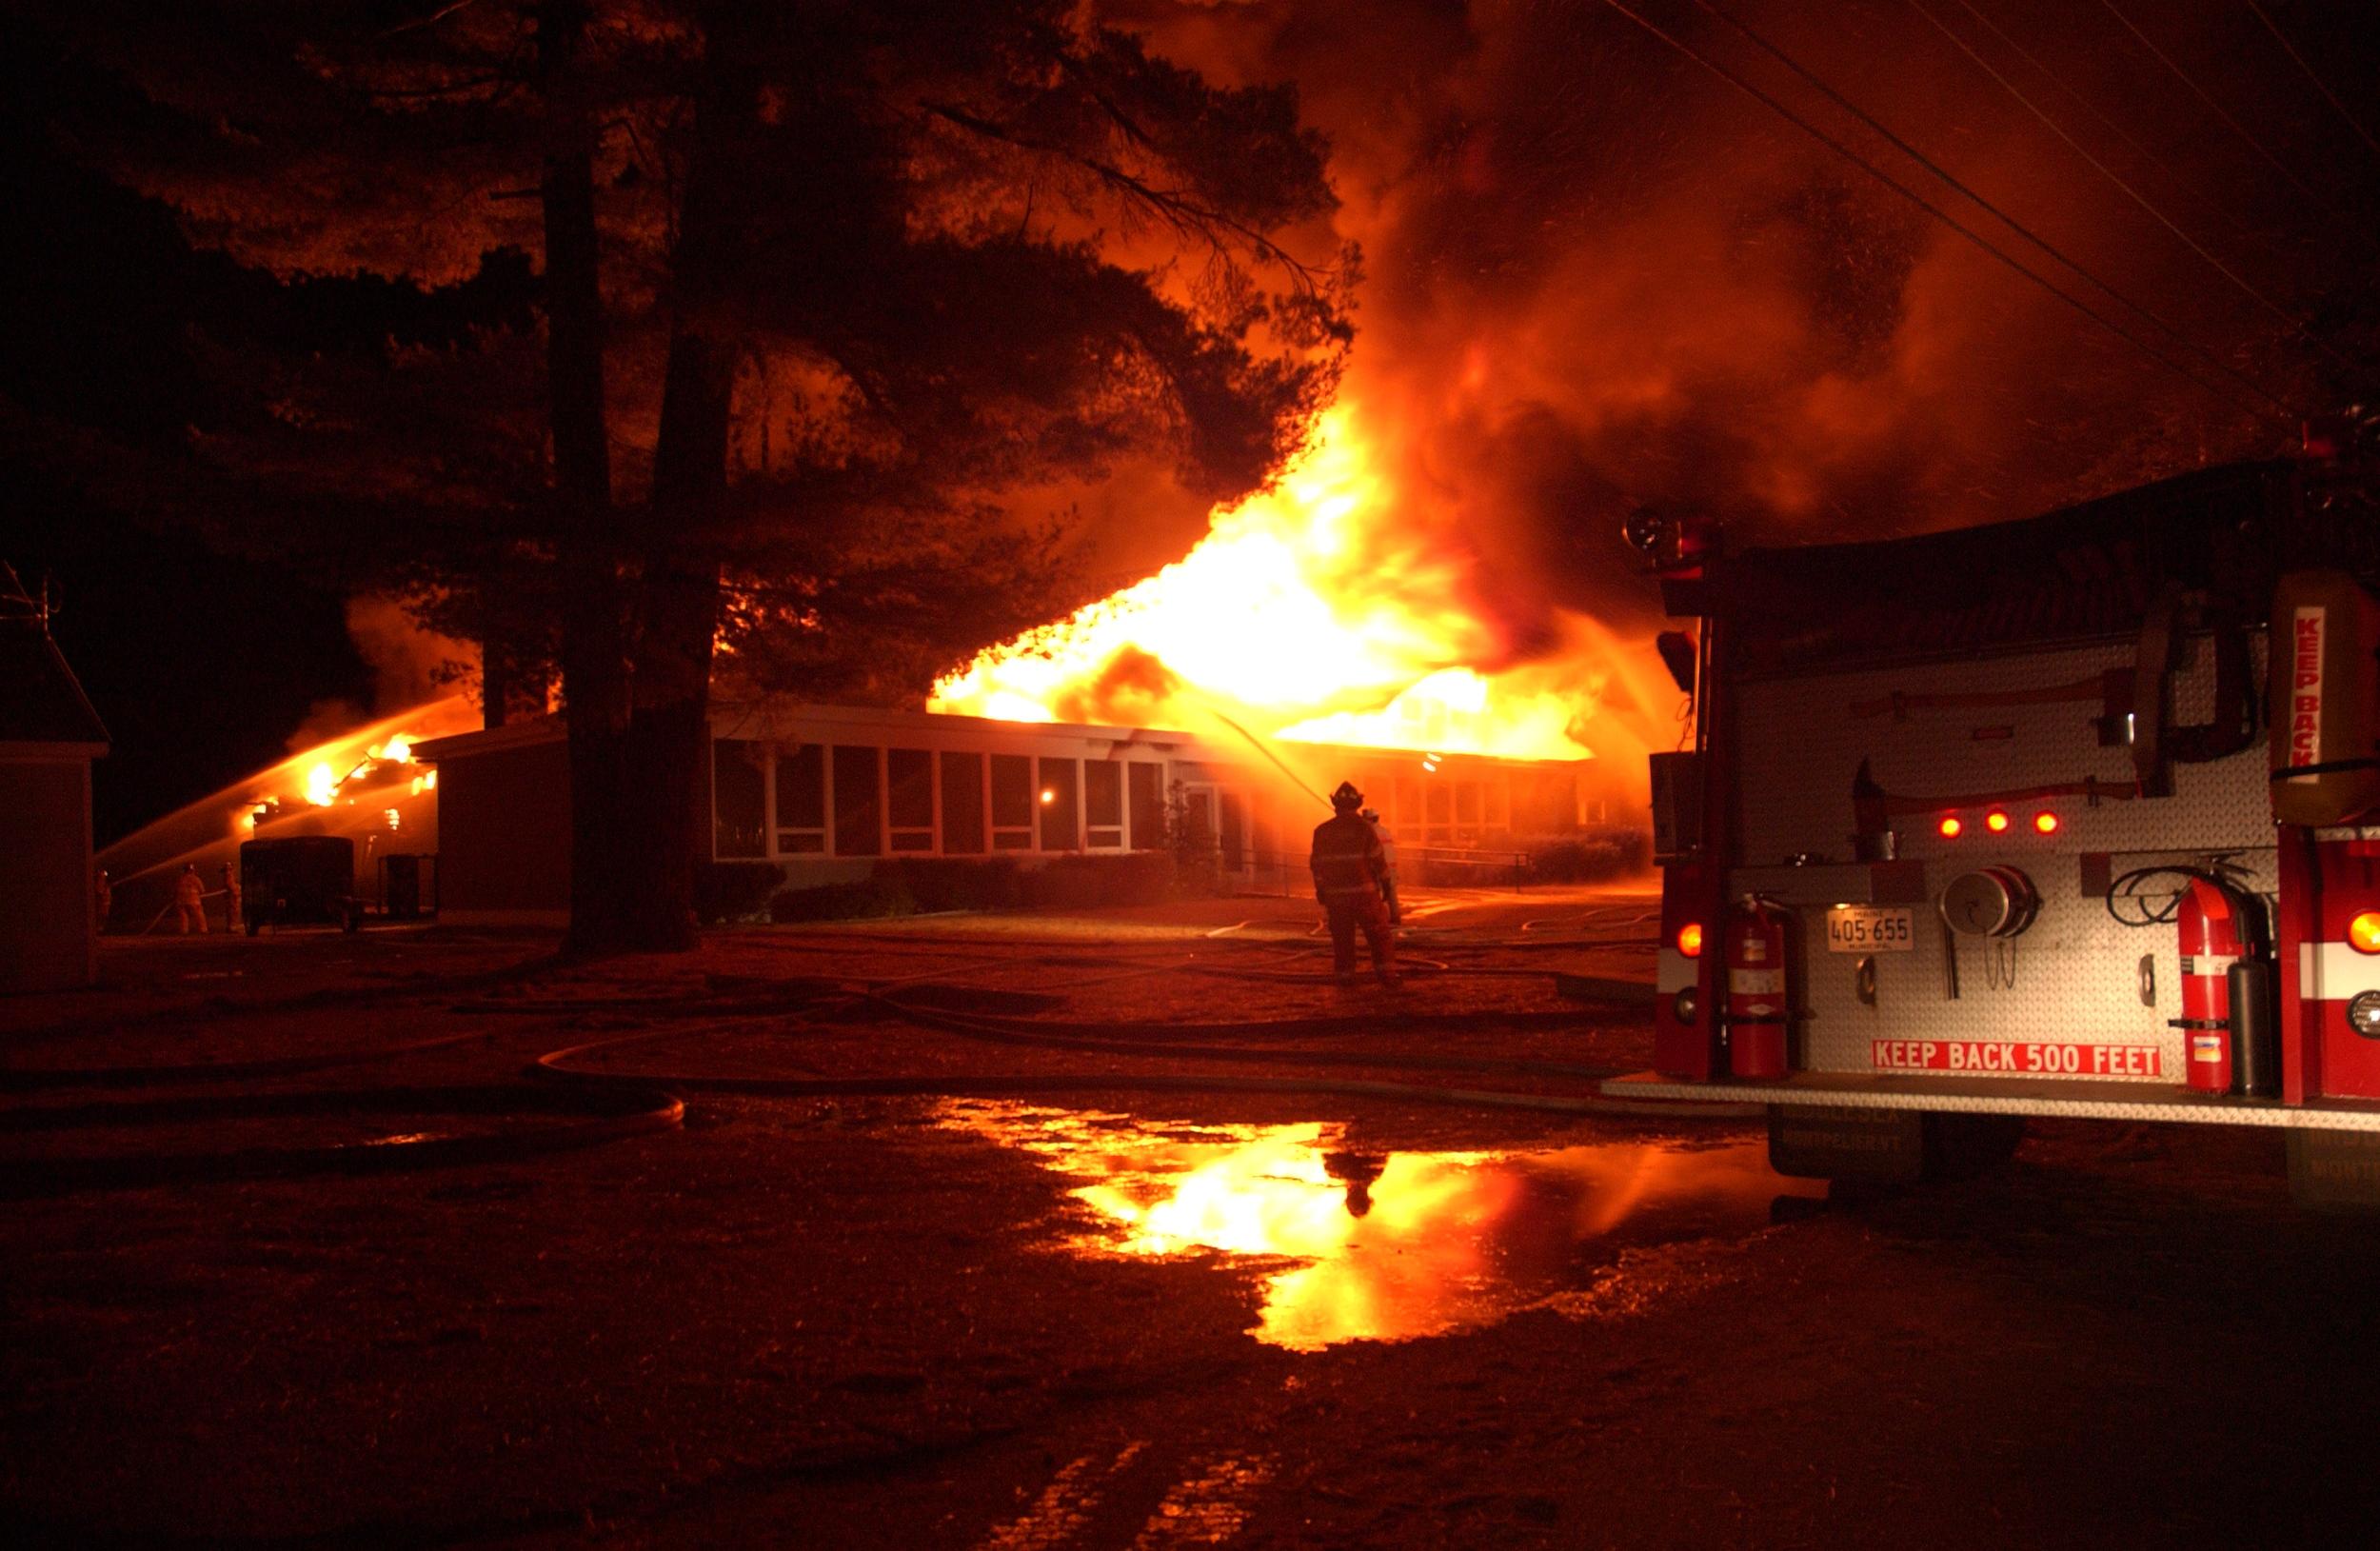 fRYBURG academy fire.JPG